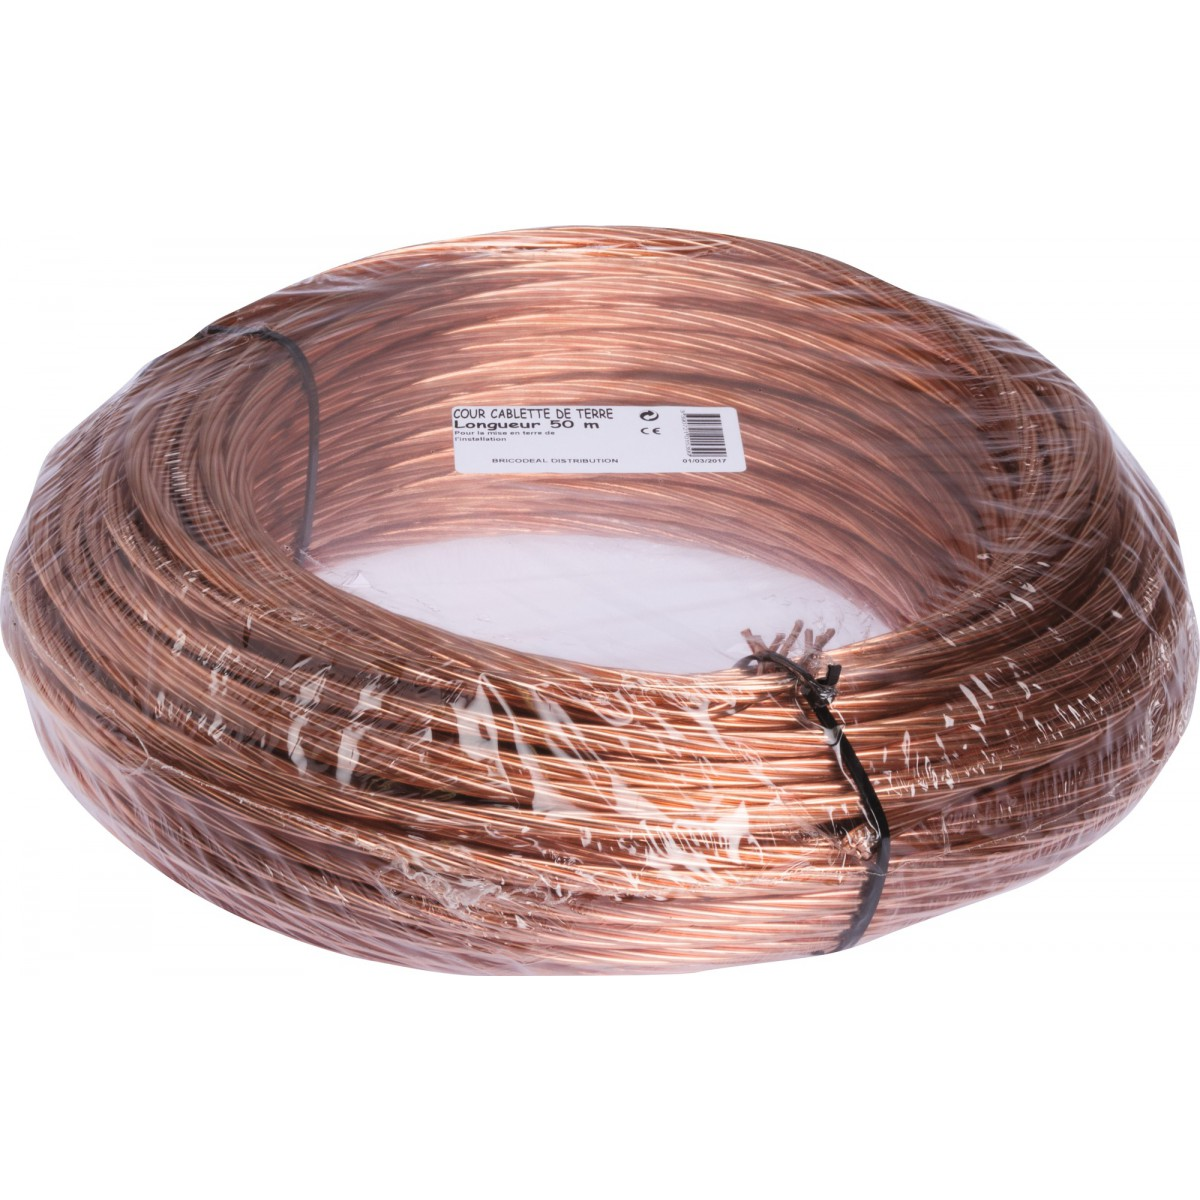 Câble terre - Couronne 50 m